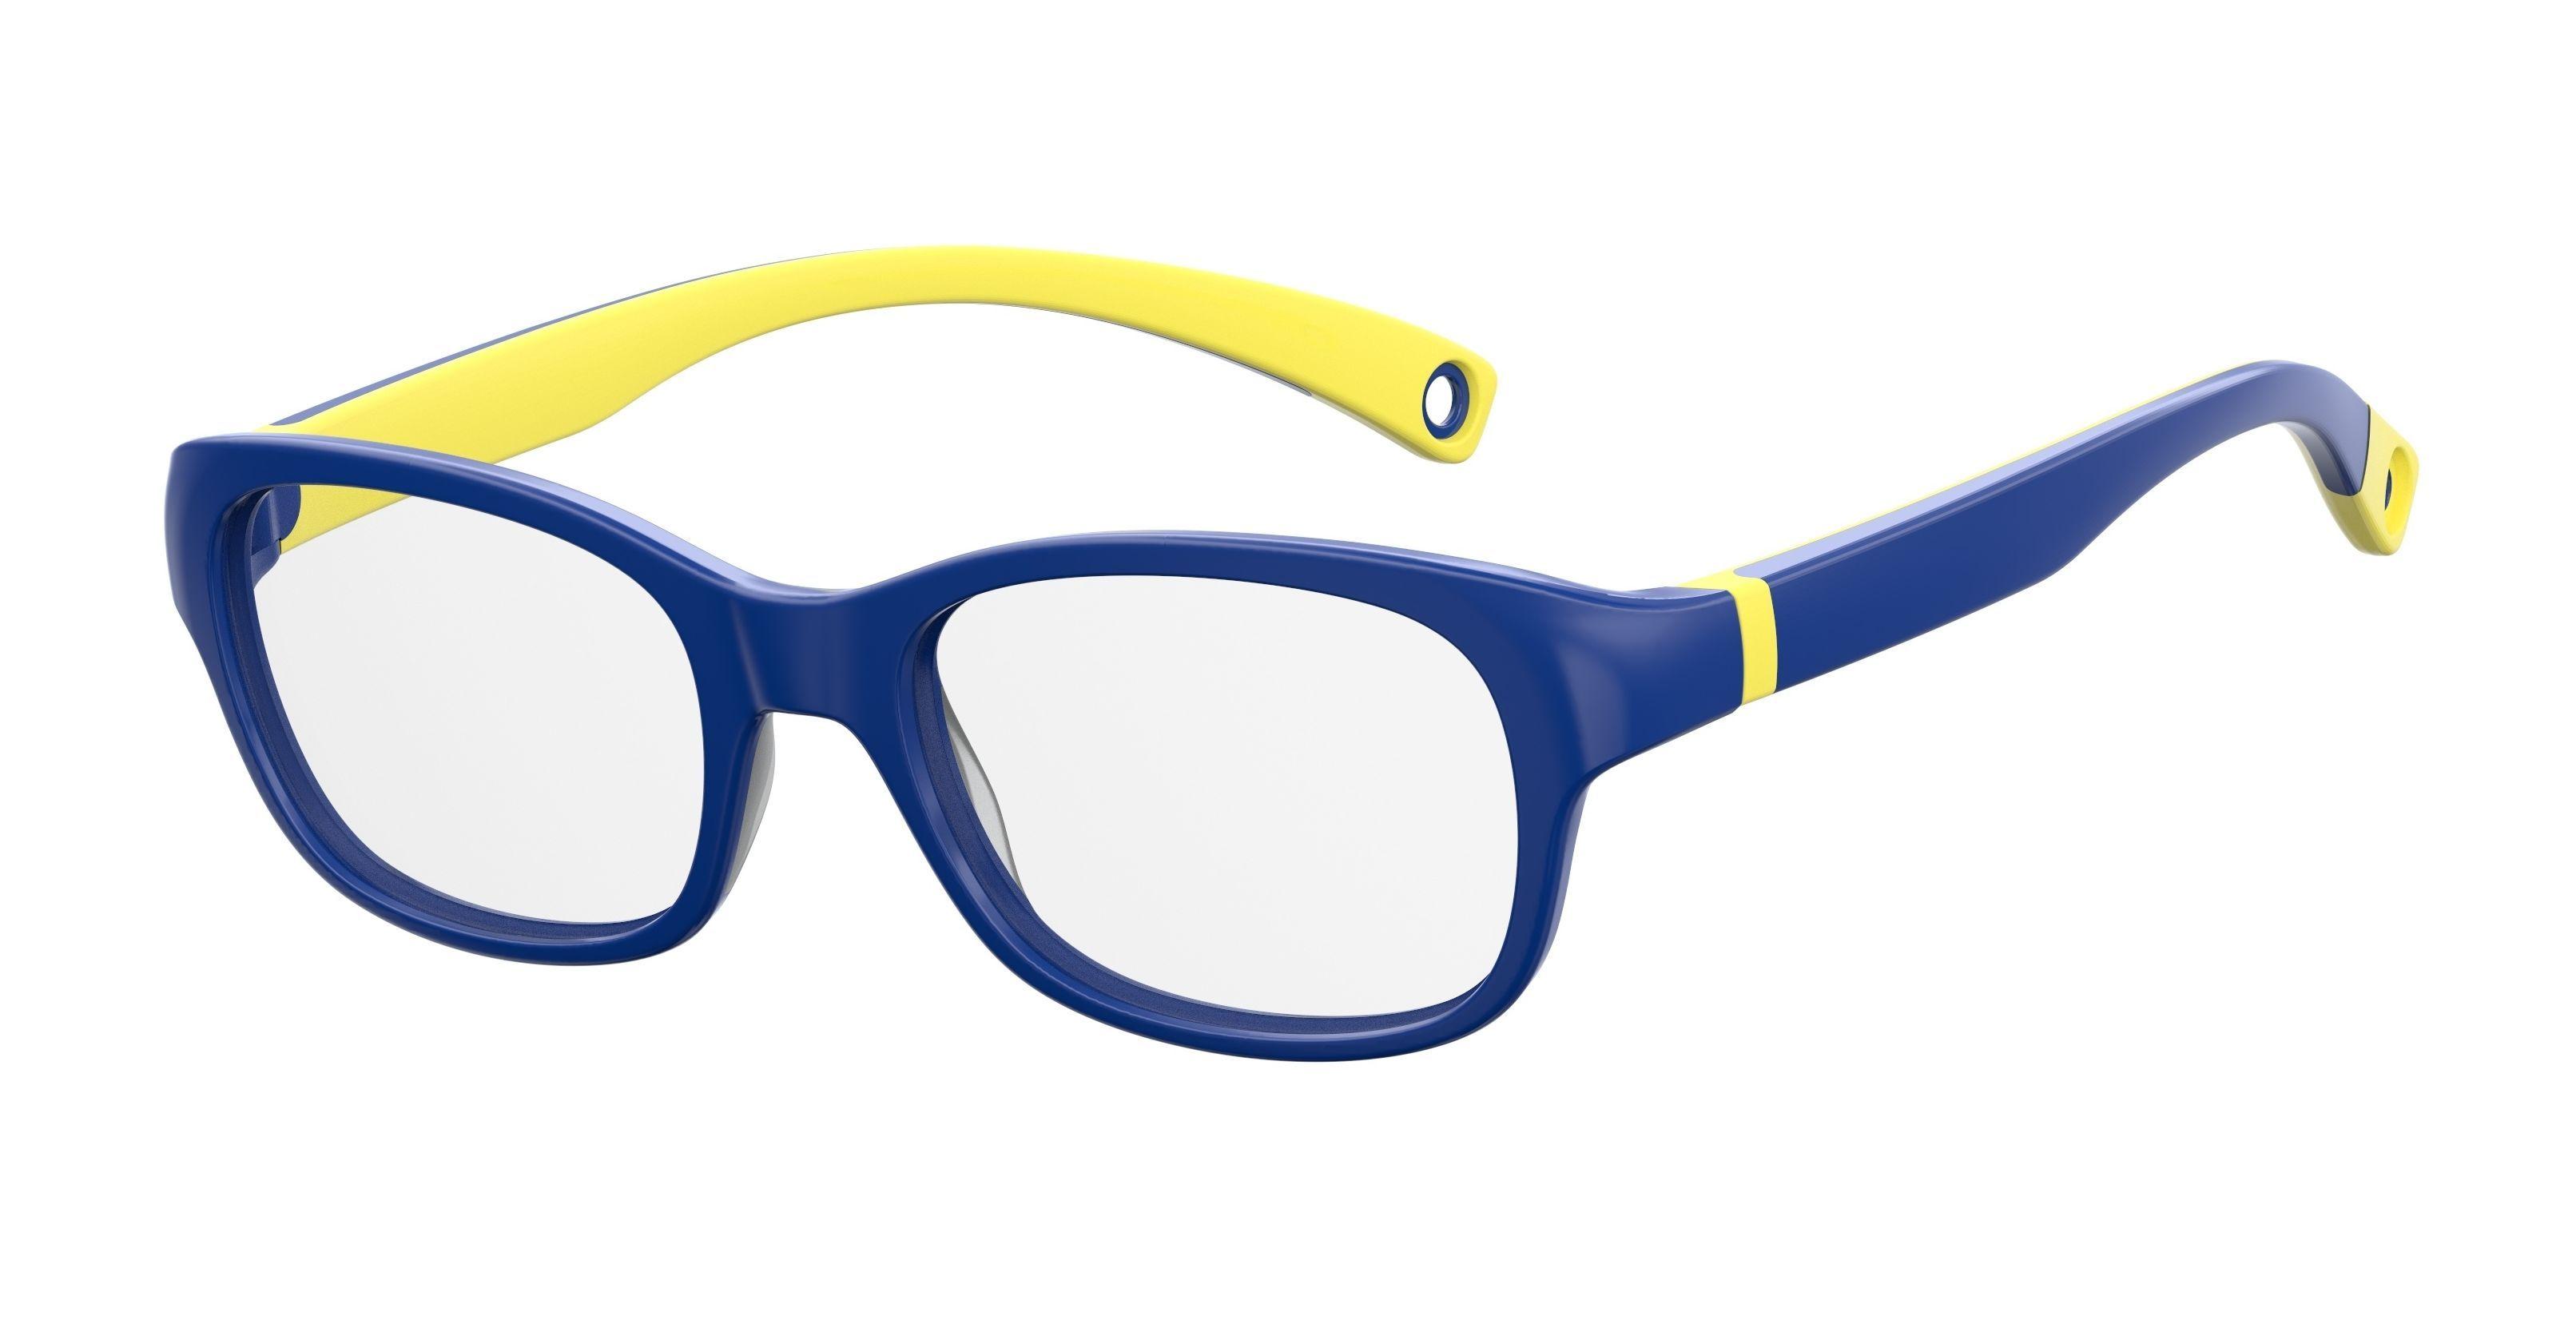 Kids By Safilo Sa0007 Eyeglasses Blue Yellow 0DCD Sa0007-0DCD - Optiwow